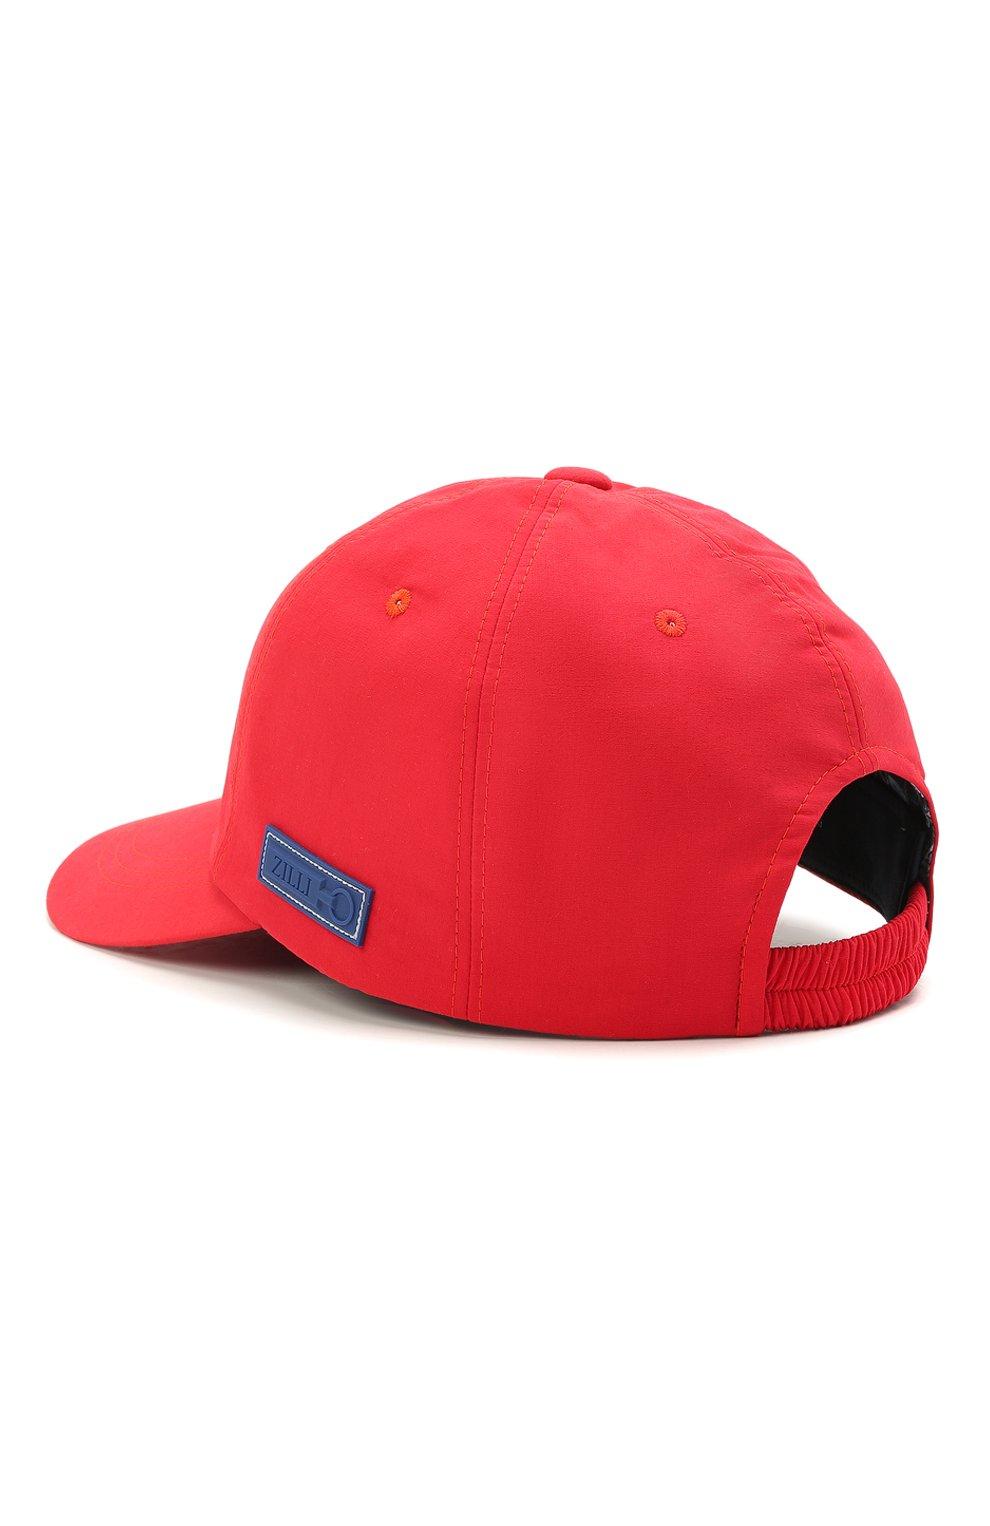 Мужской бейсболка ZILLI красного цвета, арт. MHV-CAP12-UNIC0/0001 | Фото 2 (Материал: Текстиль)